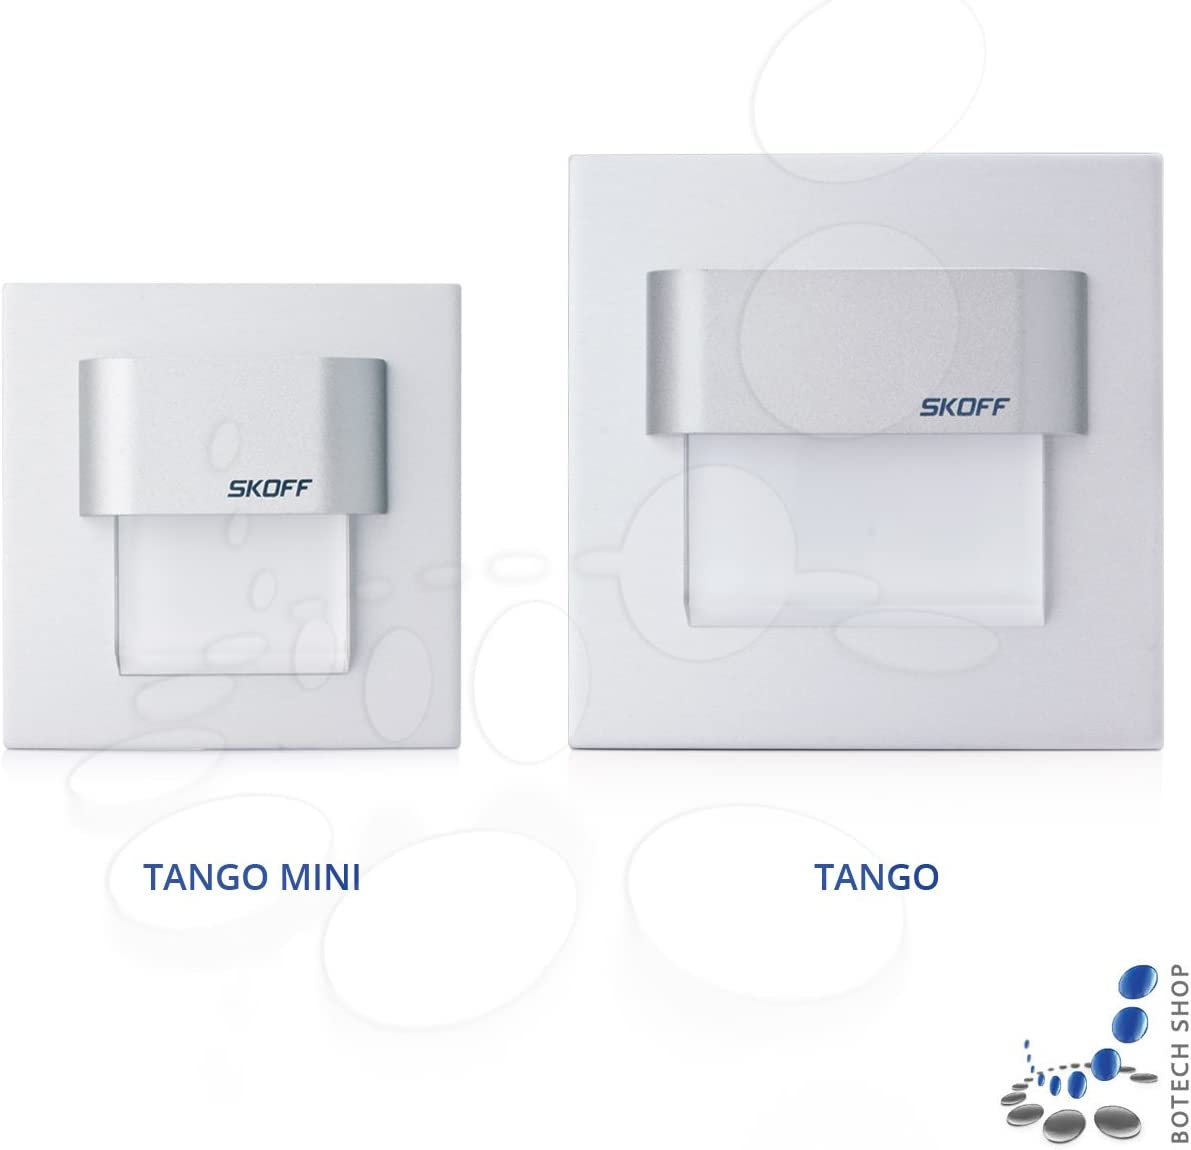 SKOFF LED Einbauleuchte 9.9 W Warm Weiß Tango MINI ML TMI G H 9 DE ...